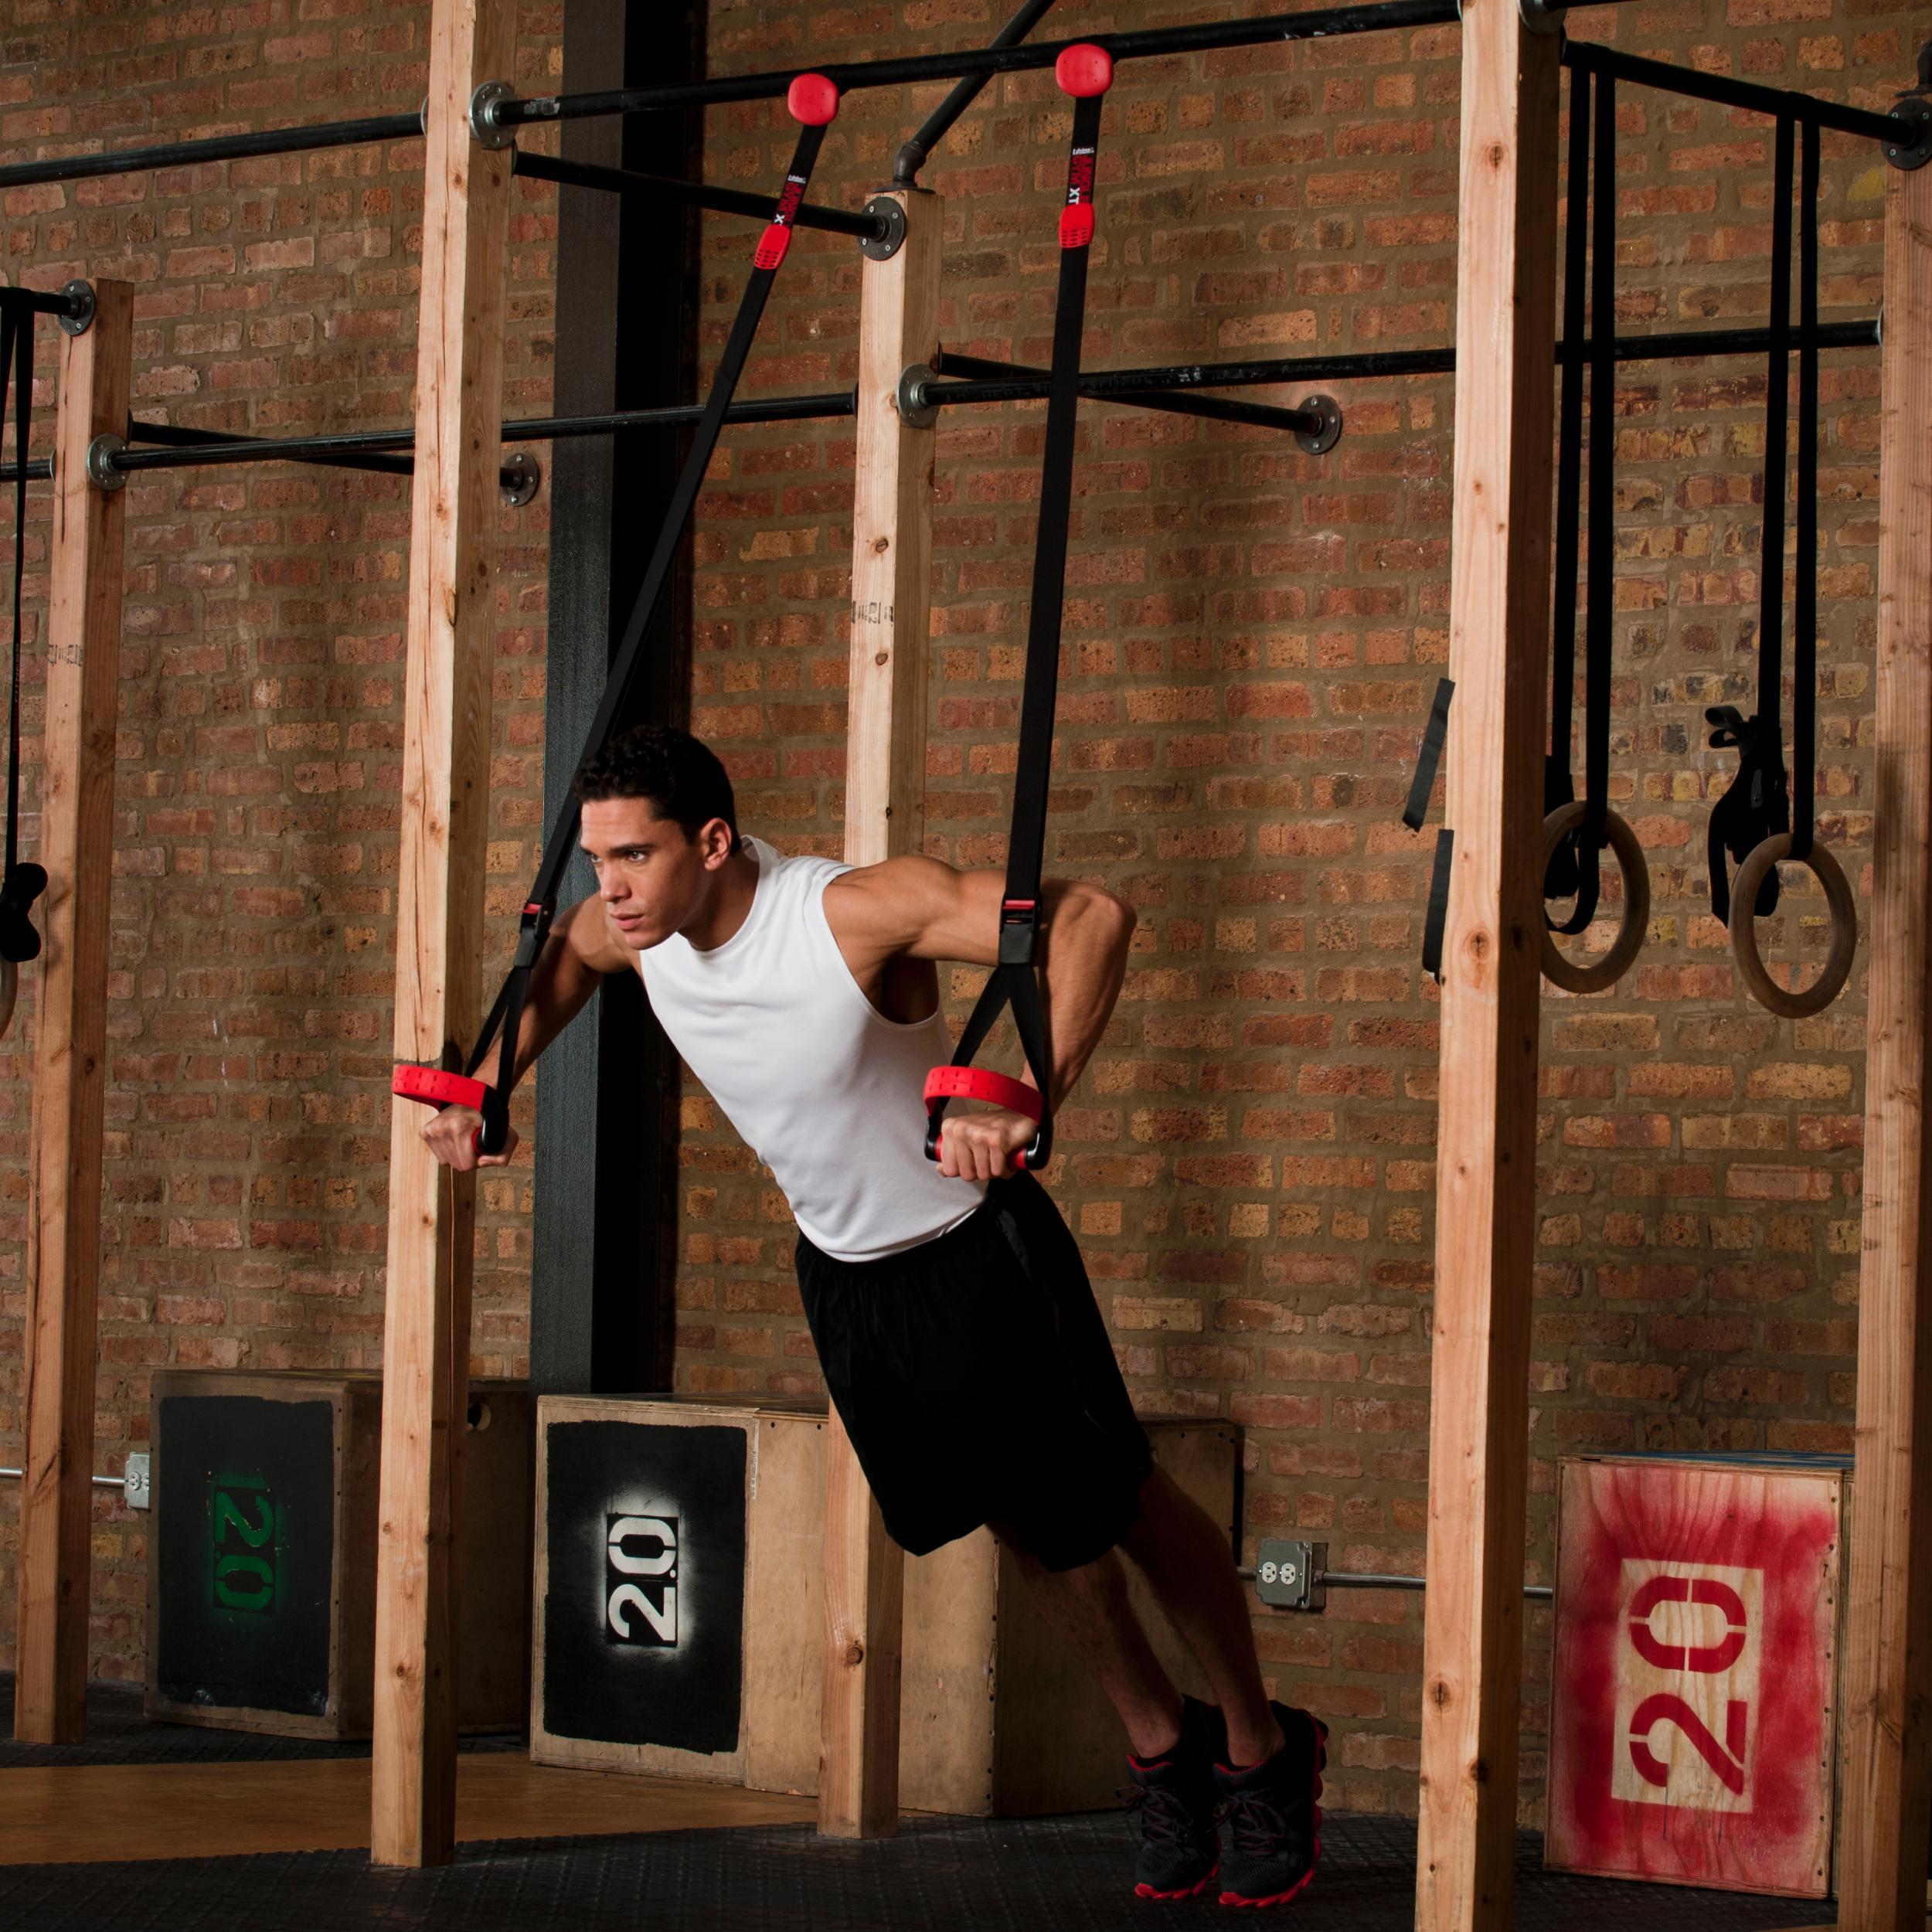 Amazon lifeline jungle gym xt home gyms sports